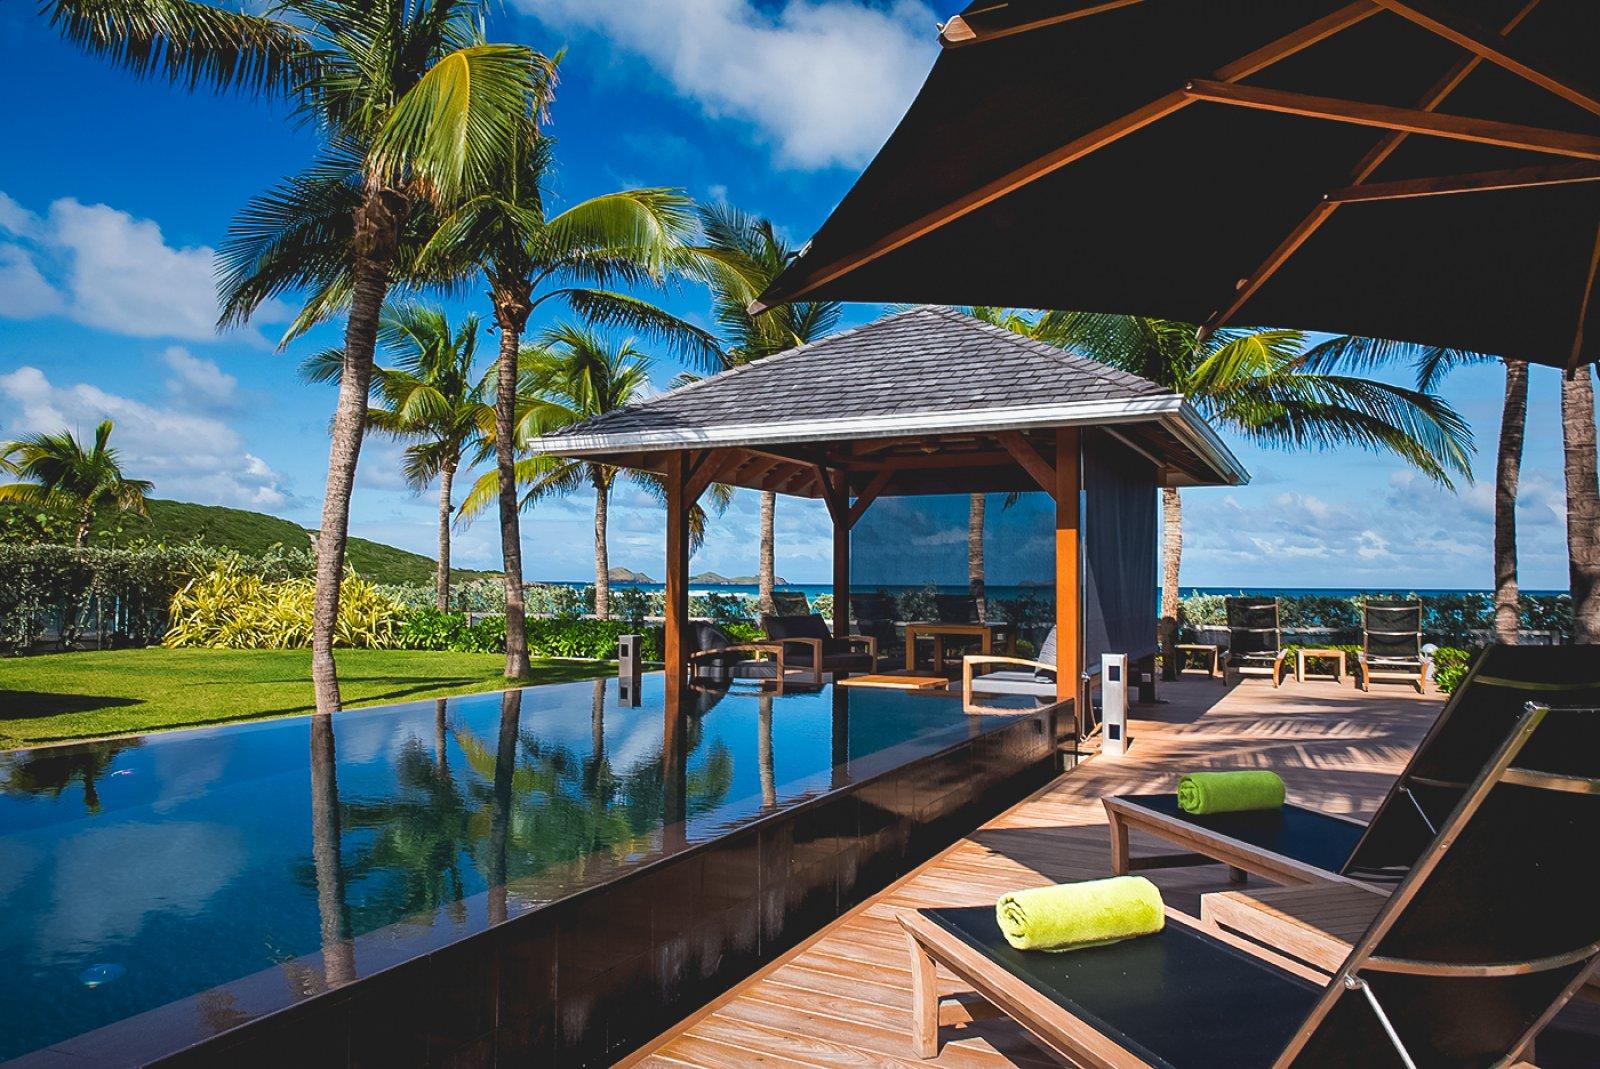 st_barts_beachfront_villa_caribbean_02